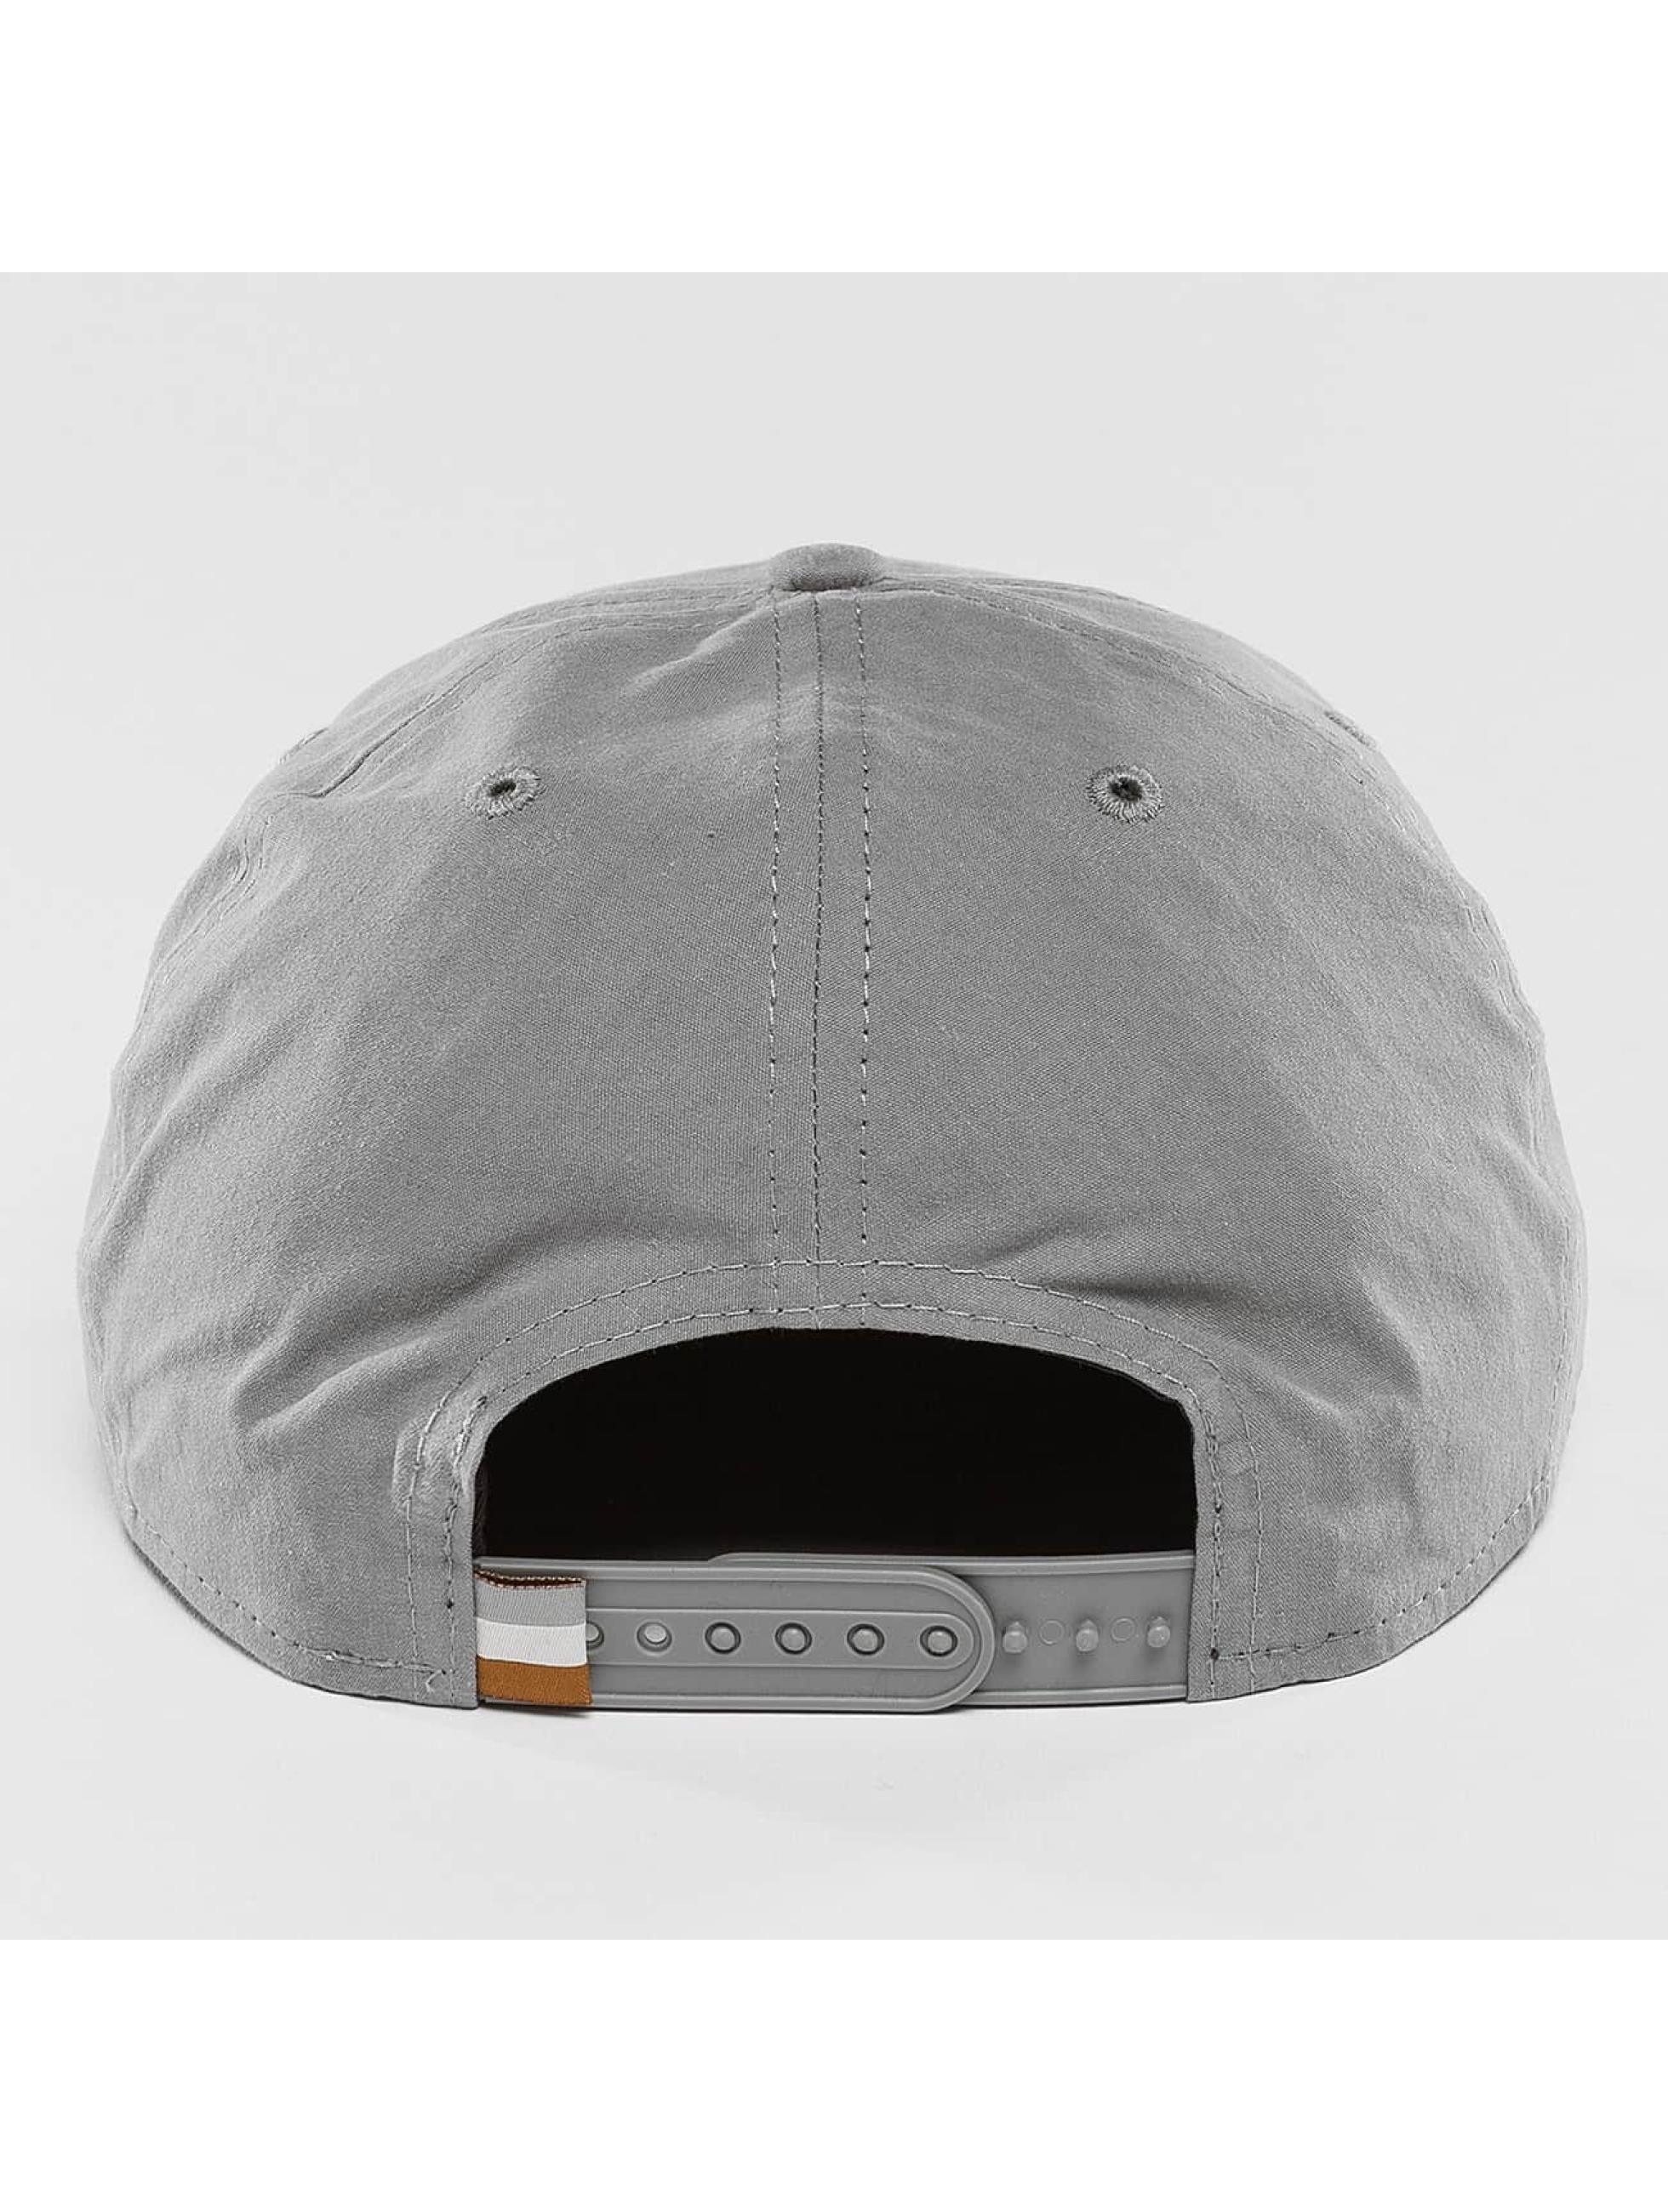 New Era Snapback Cap Lightweight Essential Philadelphia Phillies Cooperstown 9Fifty grey